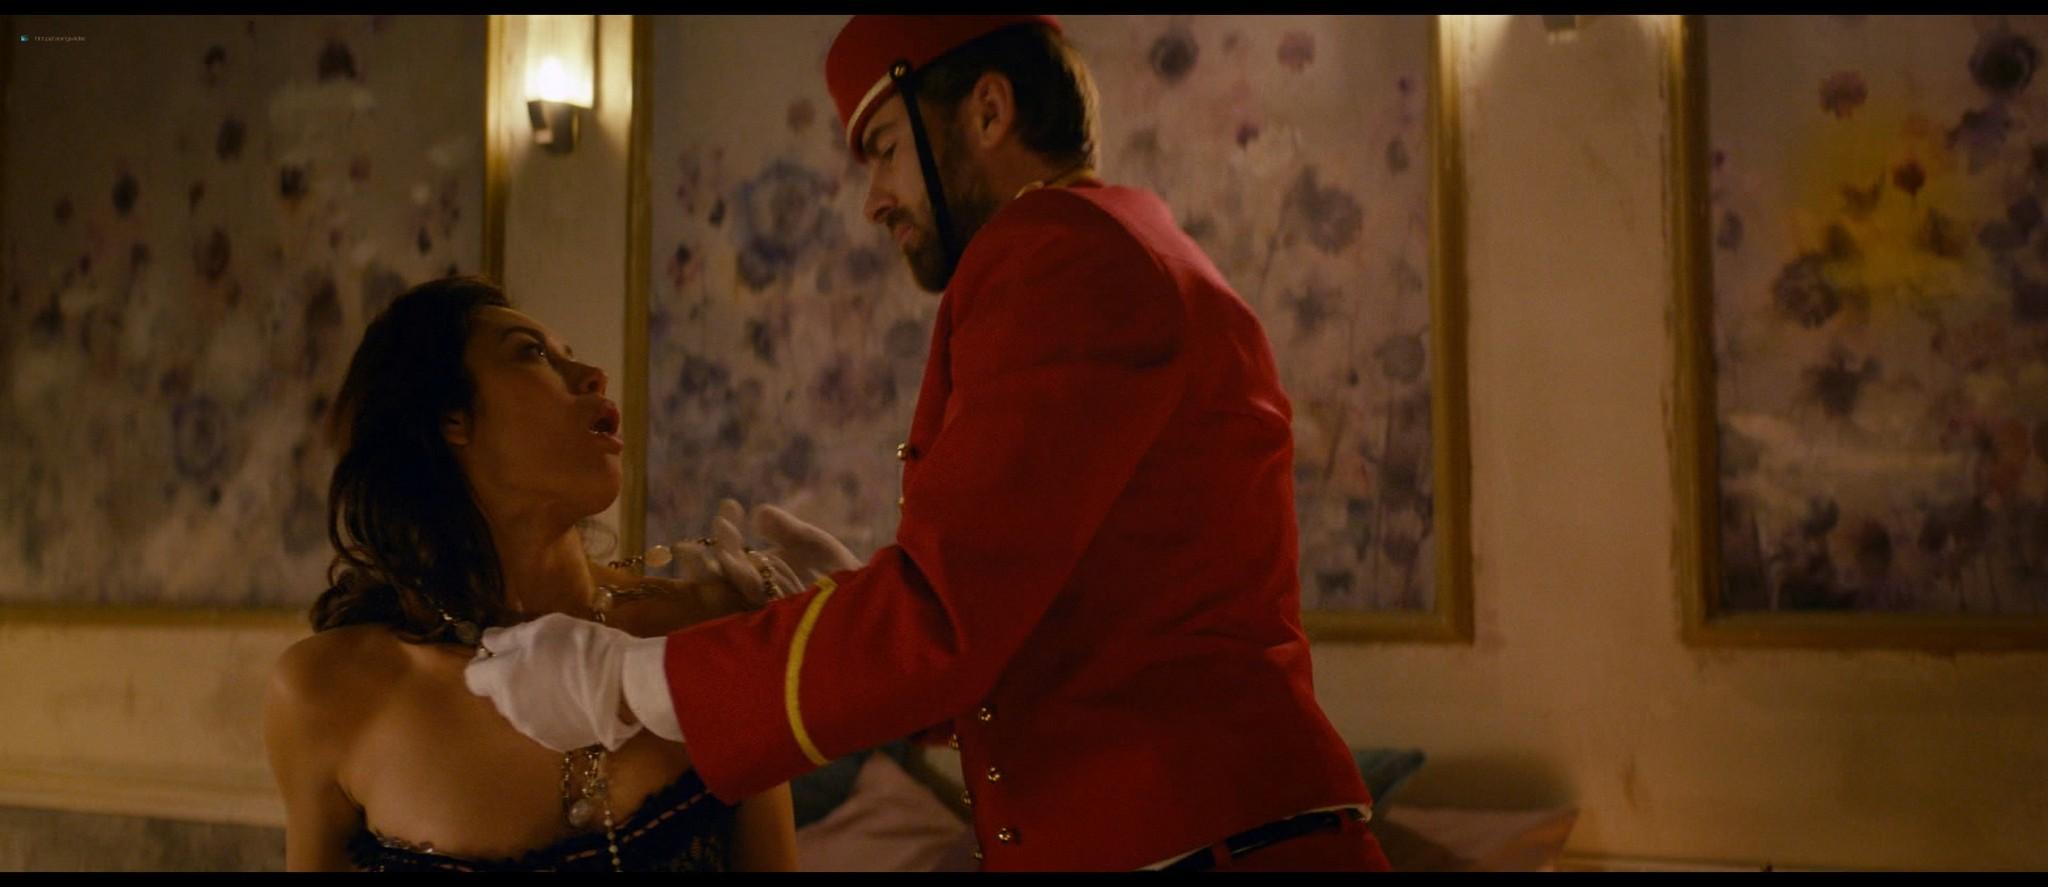 Olga Kurylenko hot and sexy in The Room (2019) HD 1080p BluRay (10)